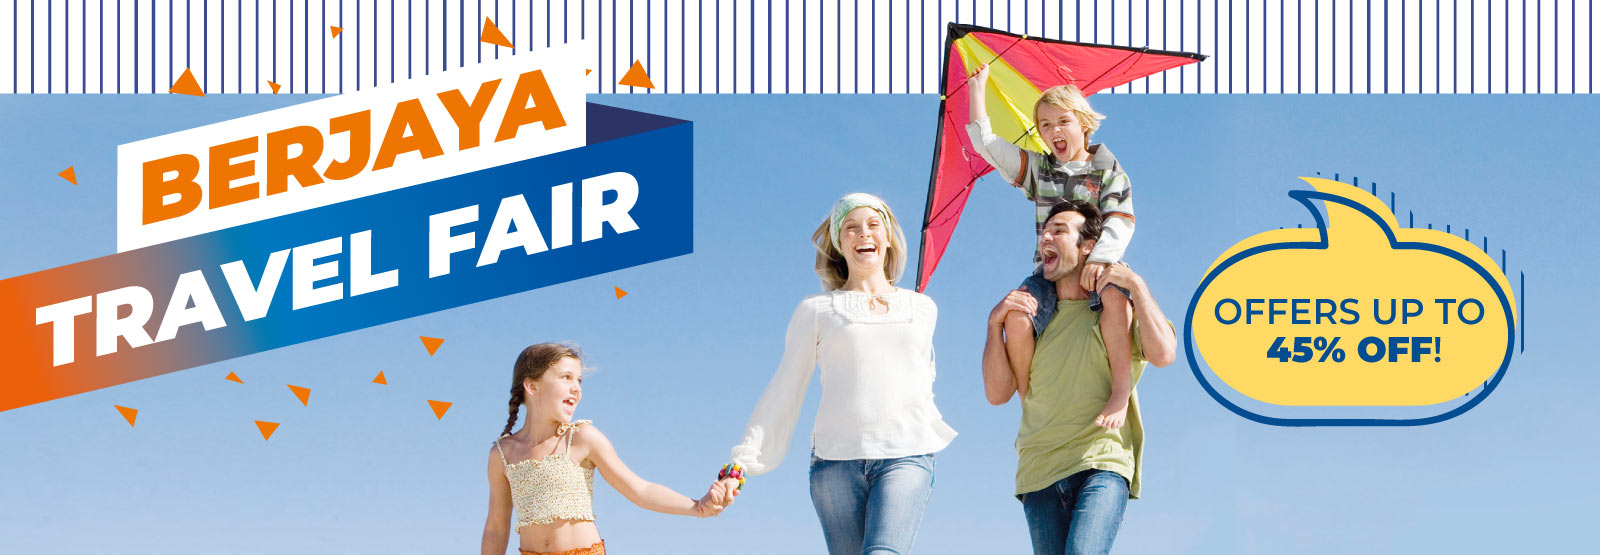 Berjaya Travel Fair Up to 45% off